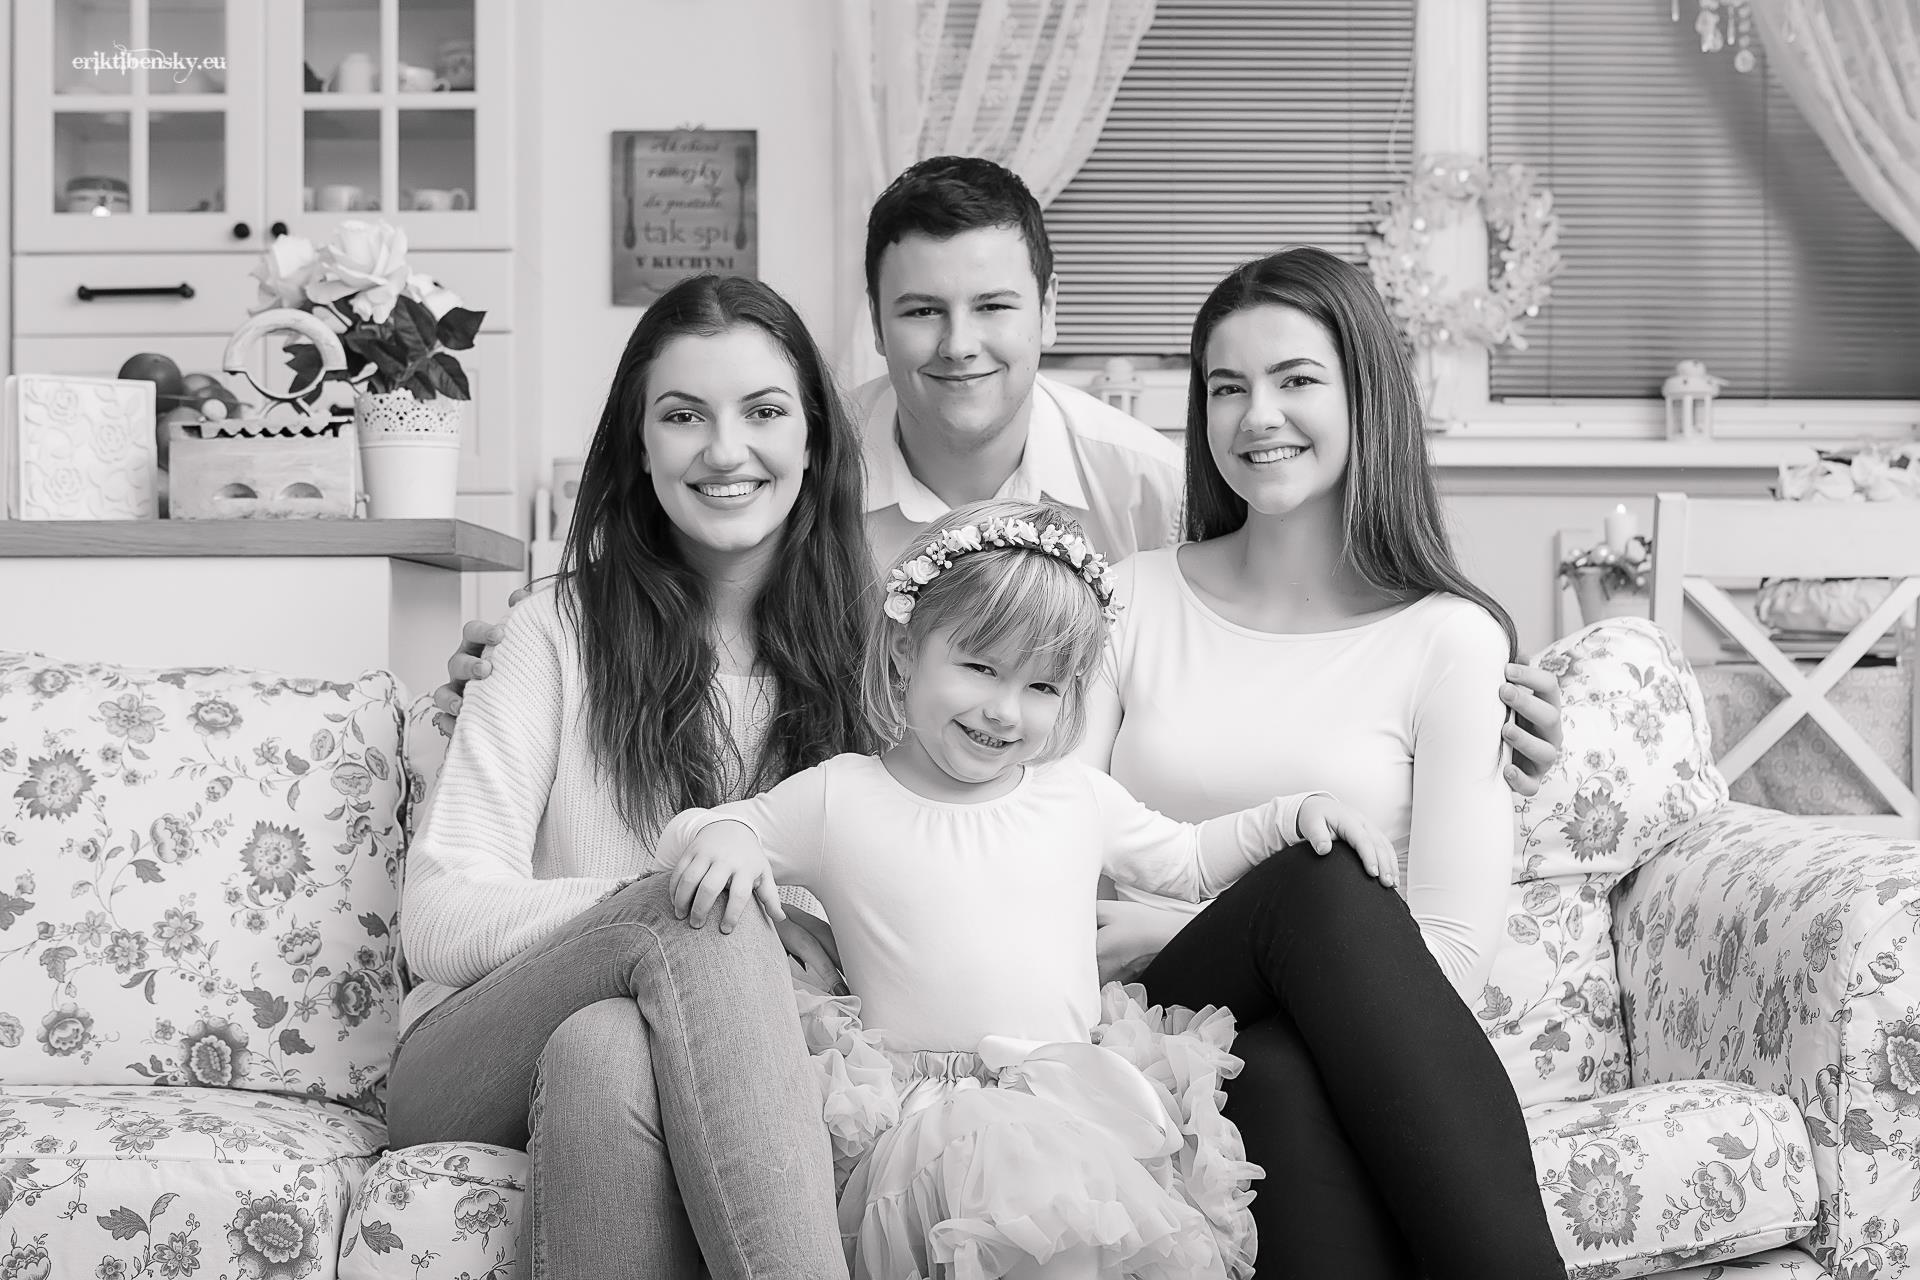 eriktibensky-eu-fotograf-home-photo-family-rodina-kids-deti-1003